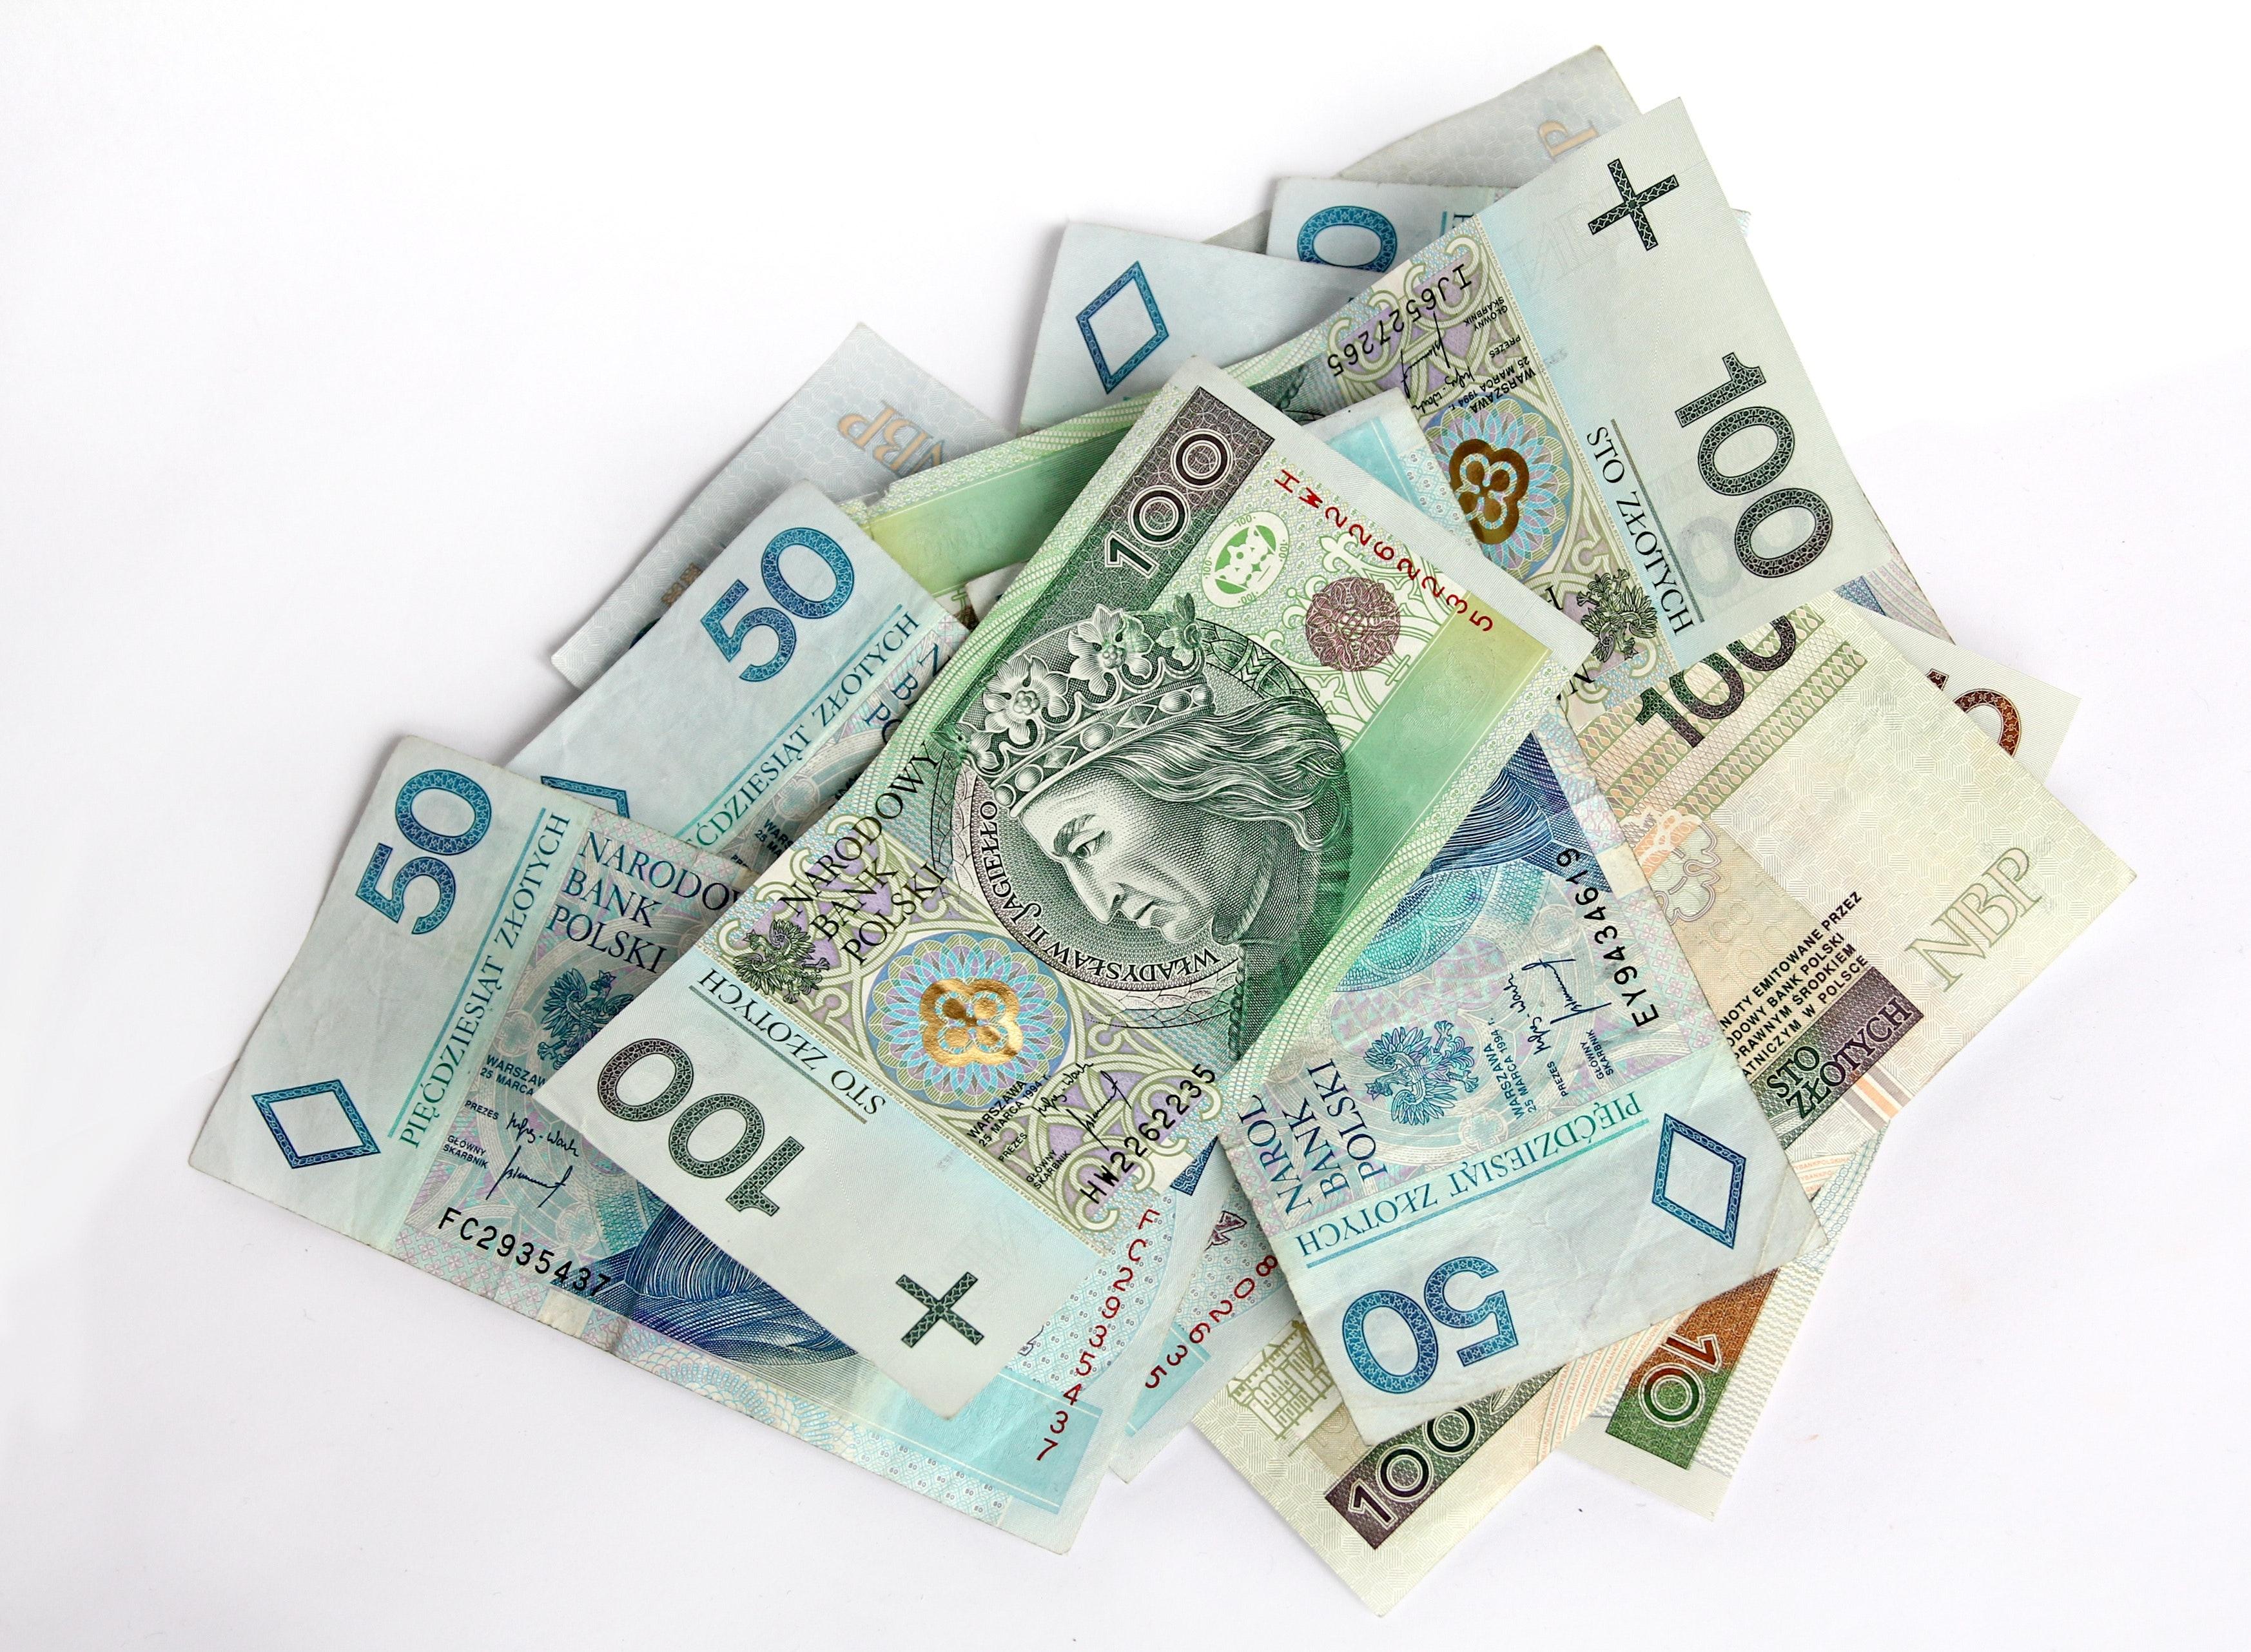 free stock photo of 100 bank notes bills